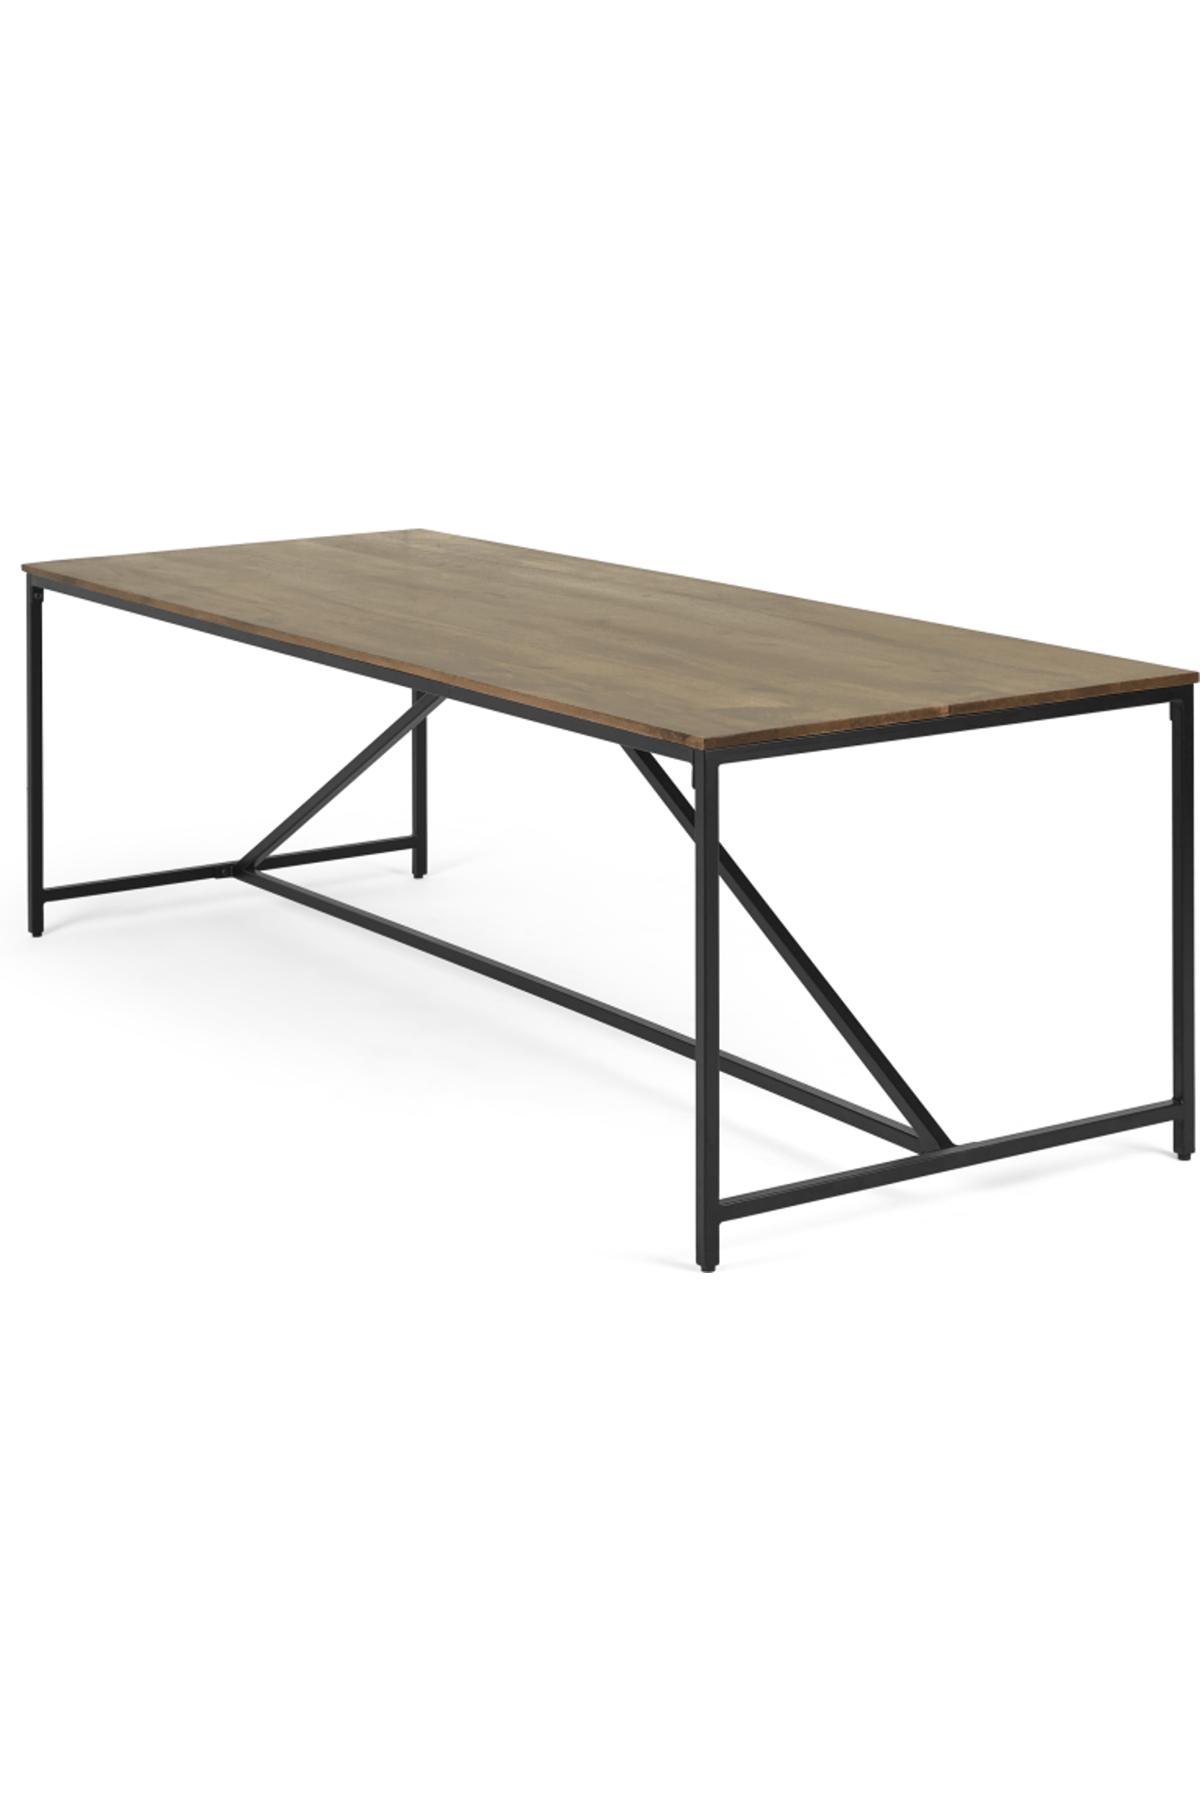 Lomond 10 Seat Extra Large Dining Table Mango Wood Dining Table